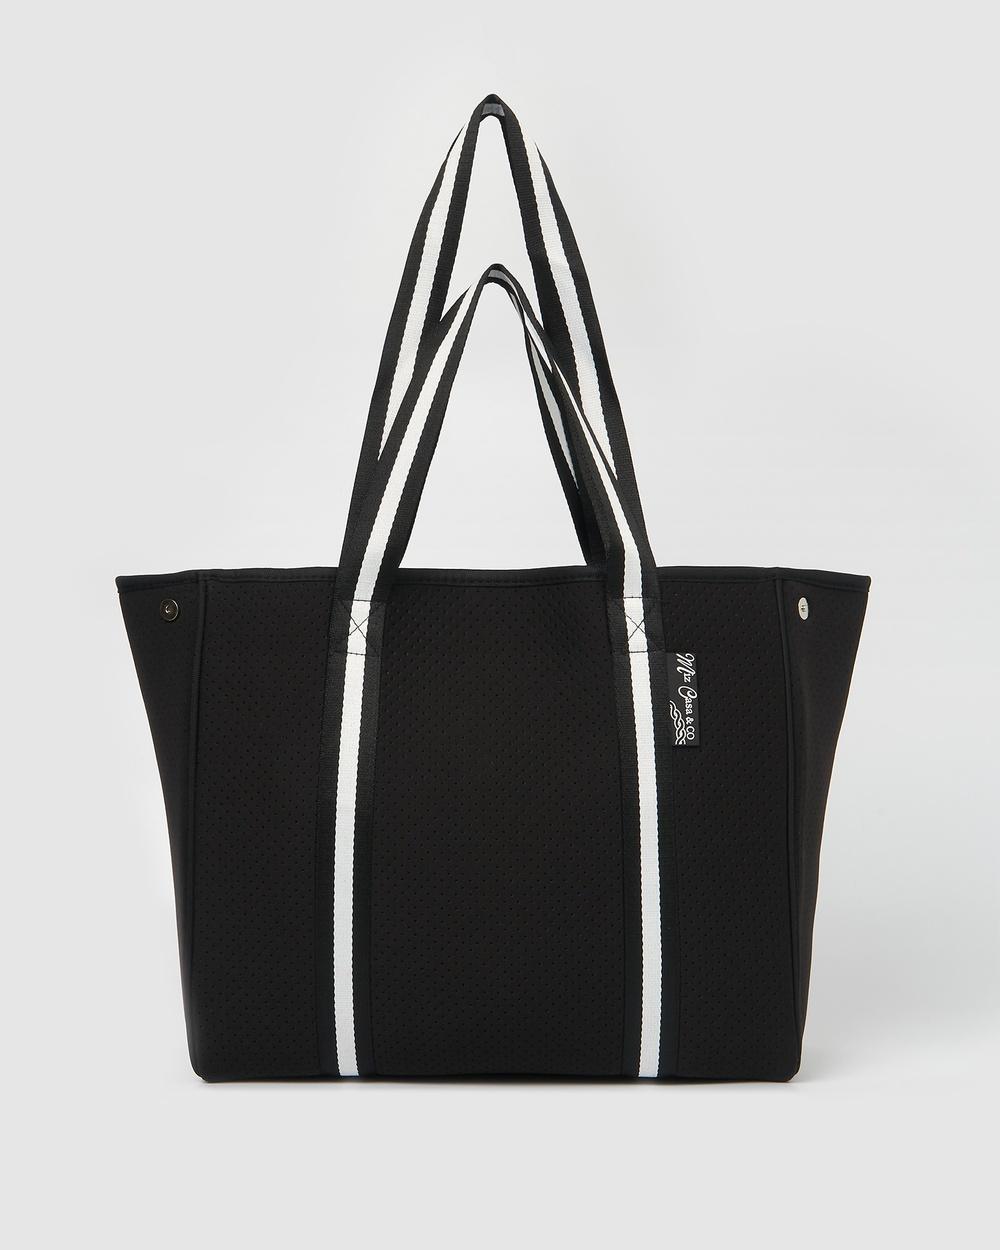 Miz Casa and Co California Neoprene Tote Bag Bags Black